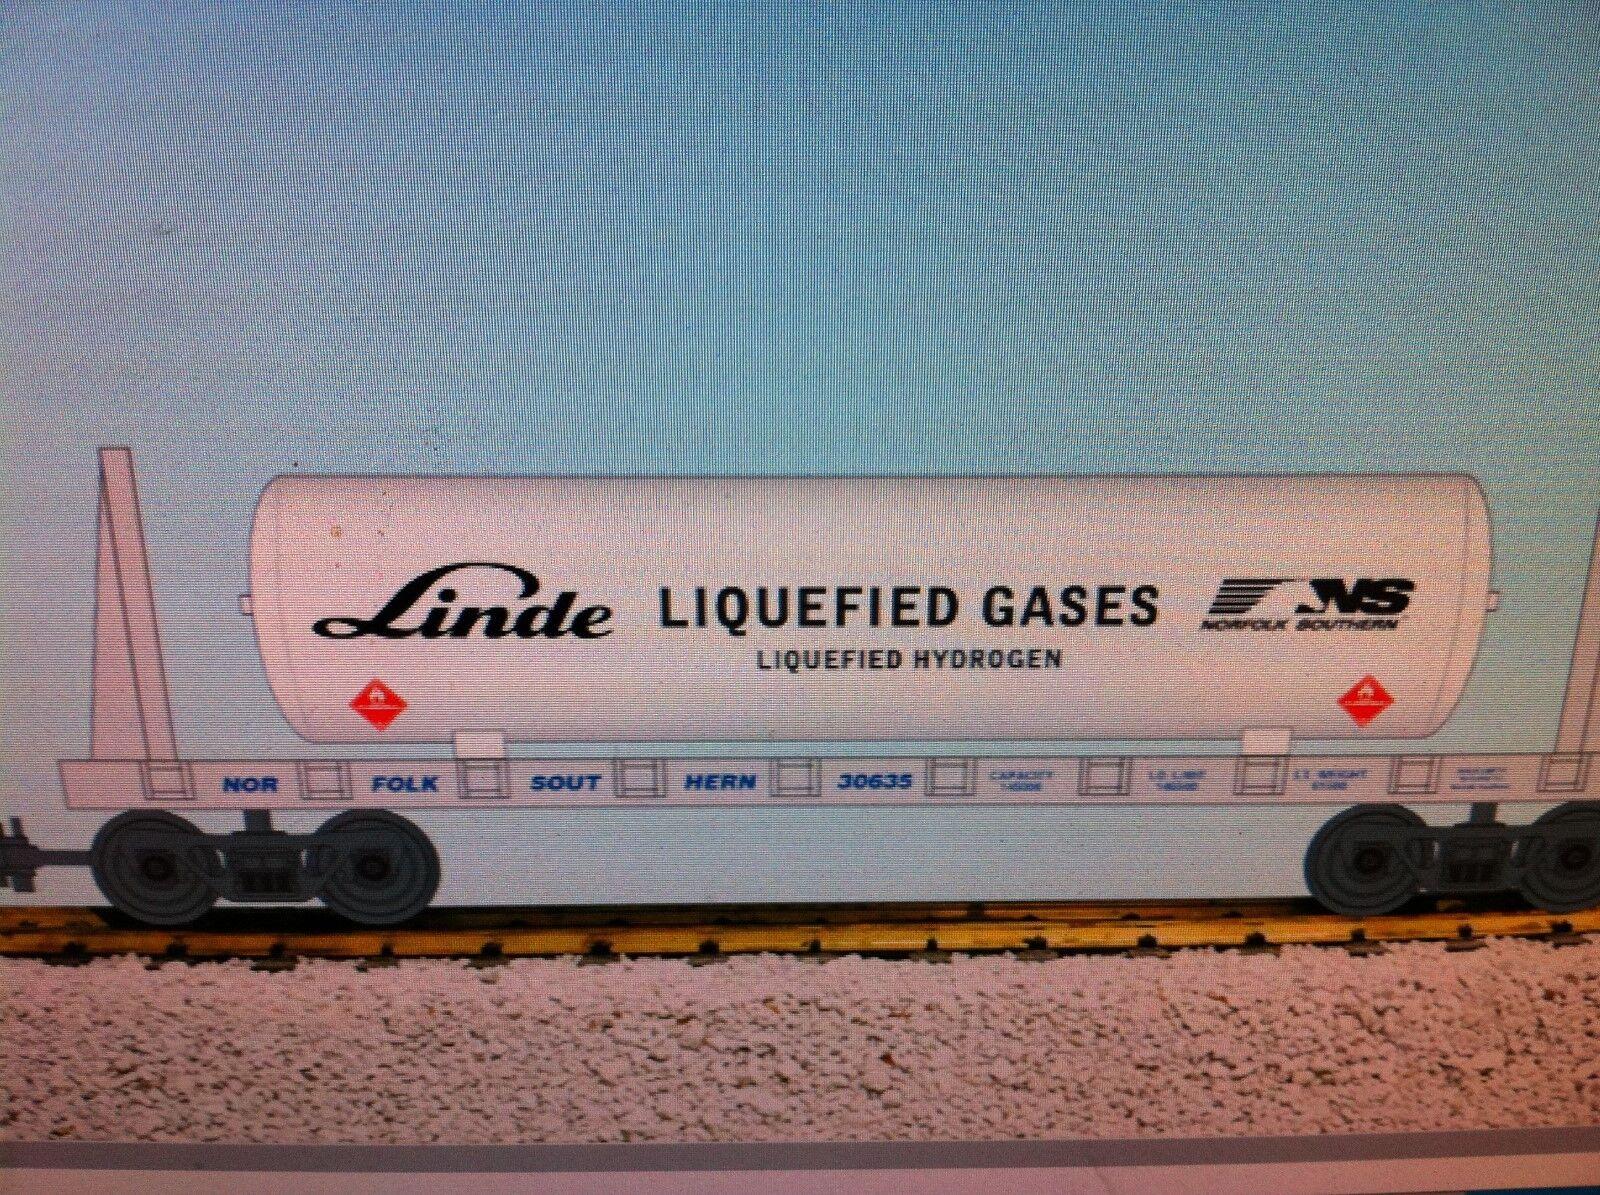 USA Trains G Scale Scale Scale r17650B Norfolk Southern BULKHEAD FC W TANK NEW ITEM f4c88b